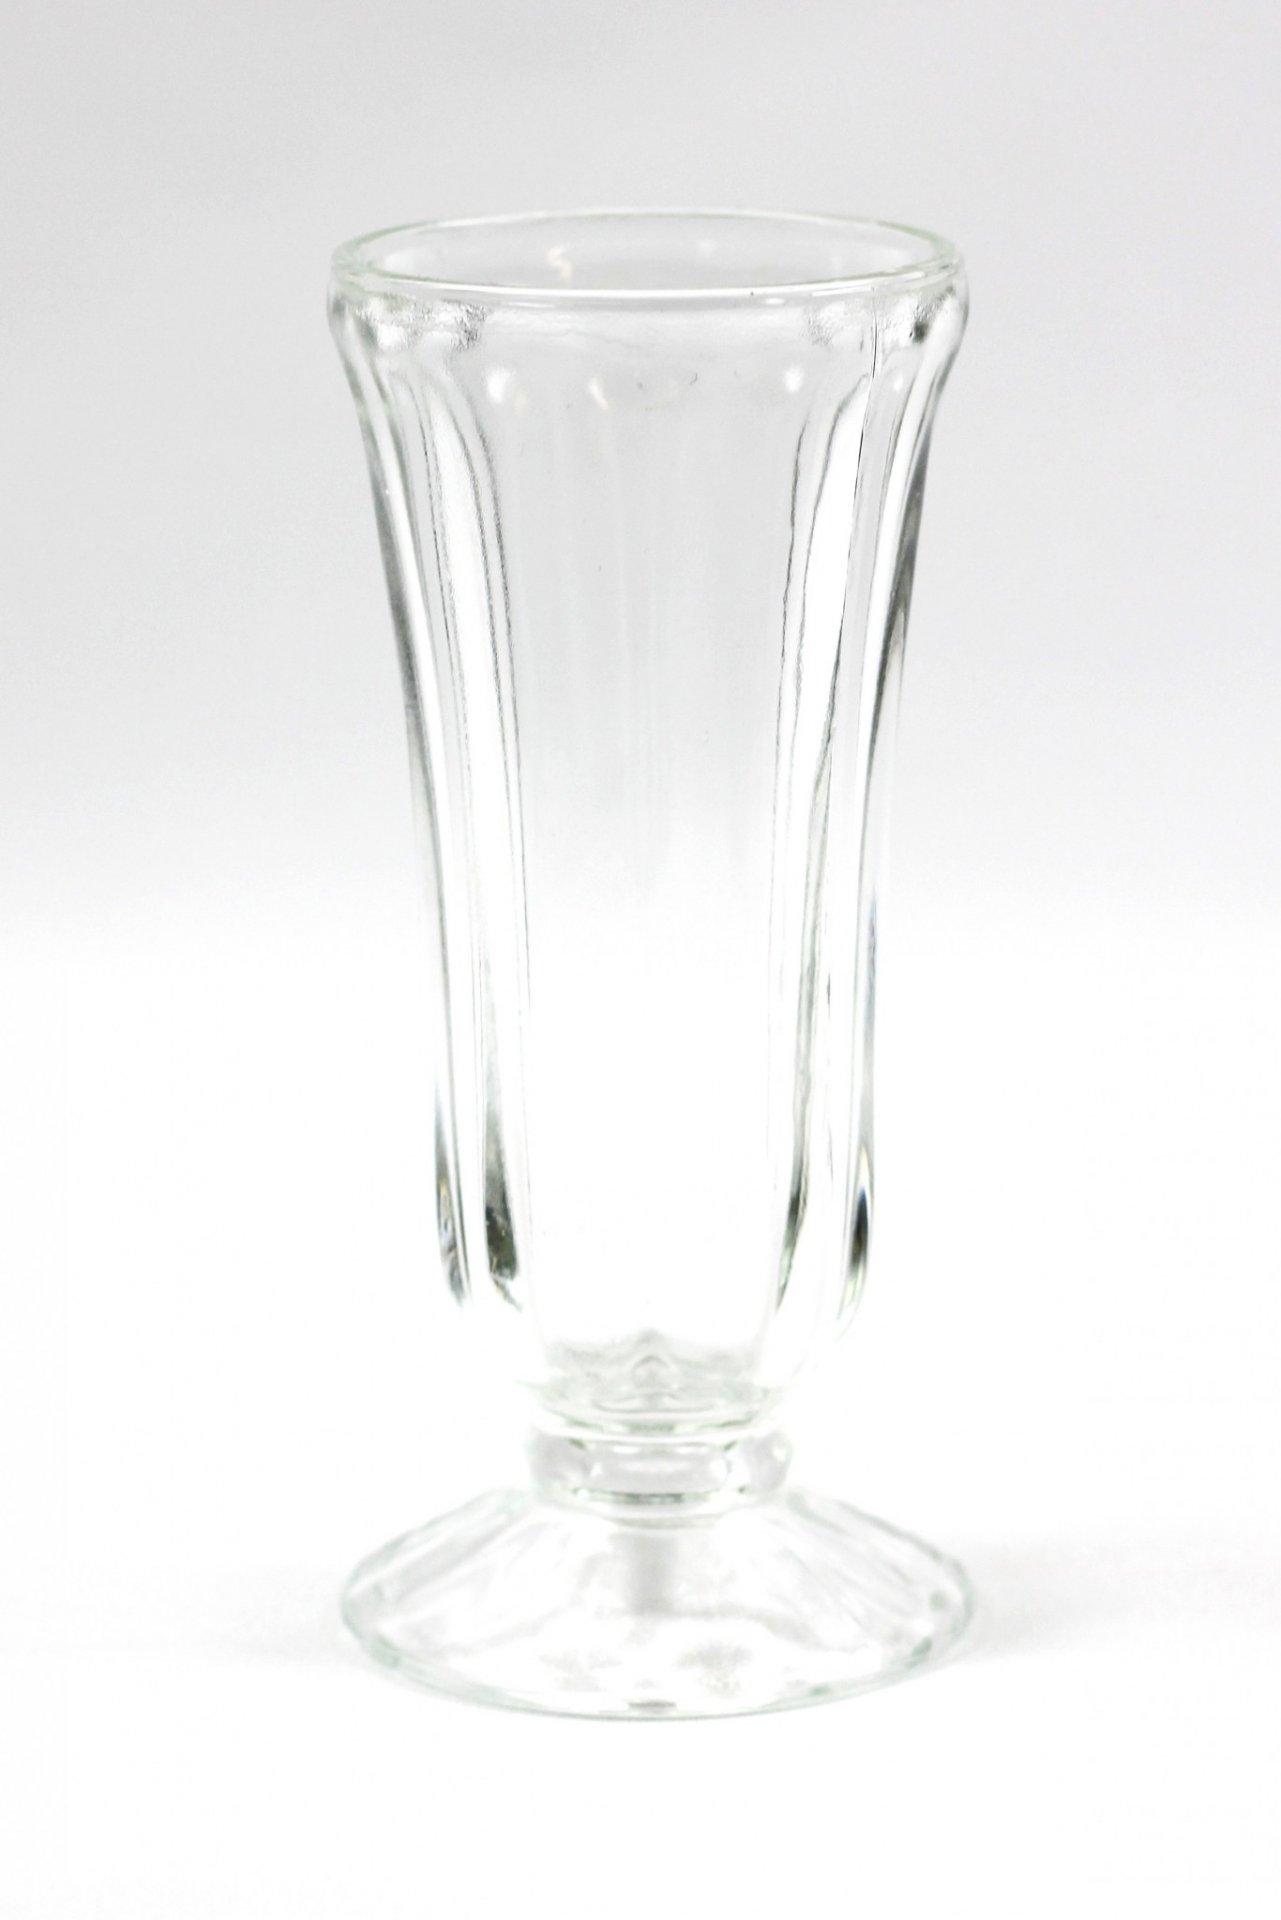 Parfait glass united rent all omaha parfait glass ura reviewsmspy